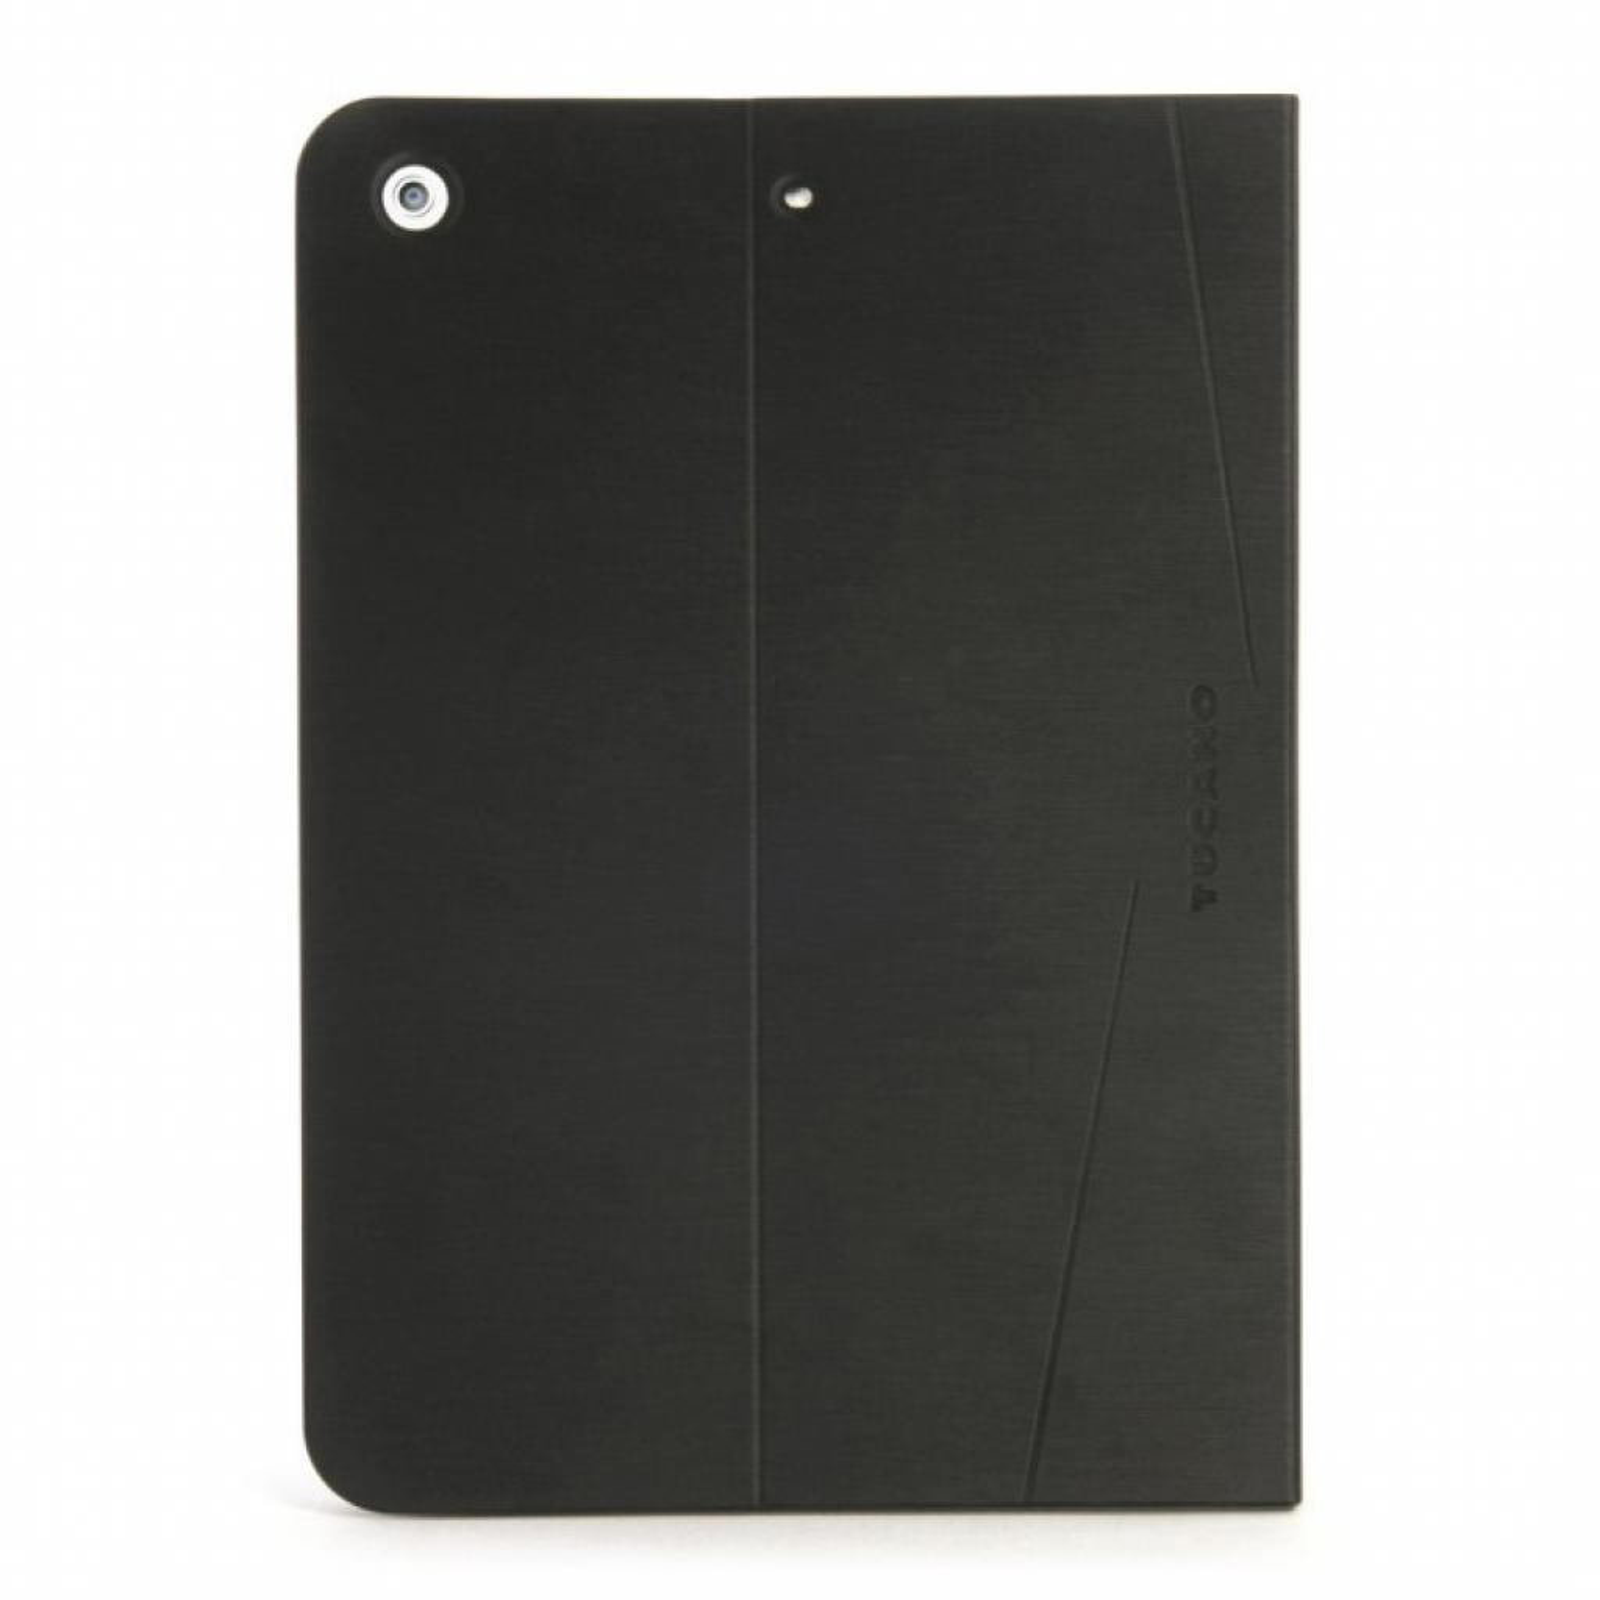 Чехол для планшета Tucano iPad Air Filo Black (IPD5FI) изображение 5